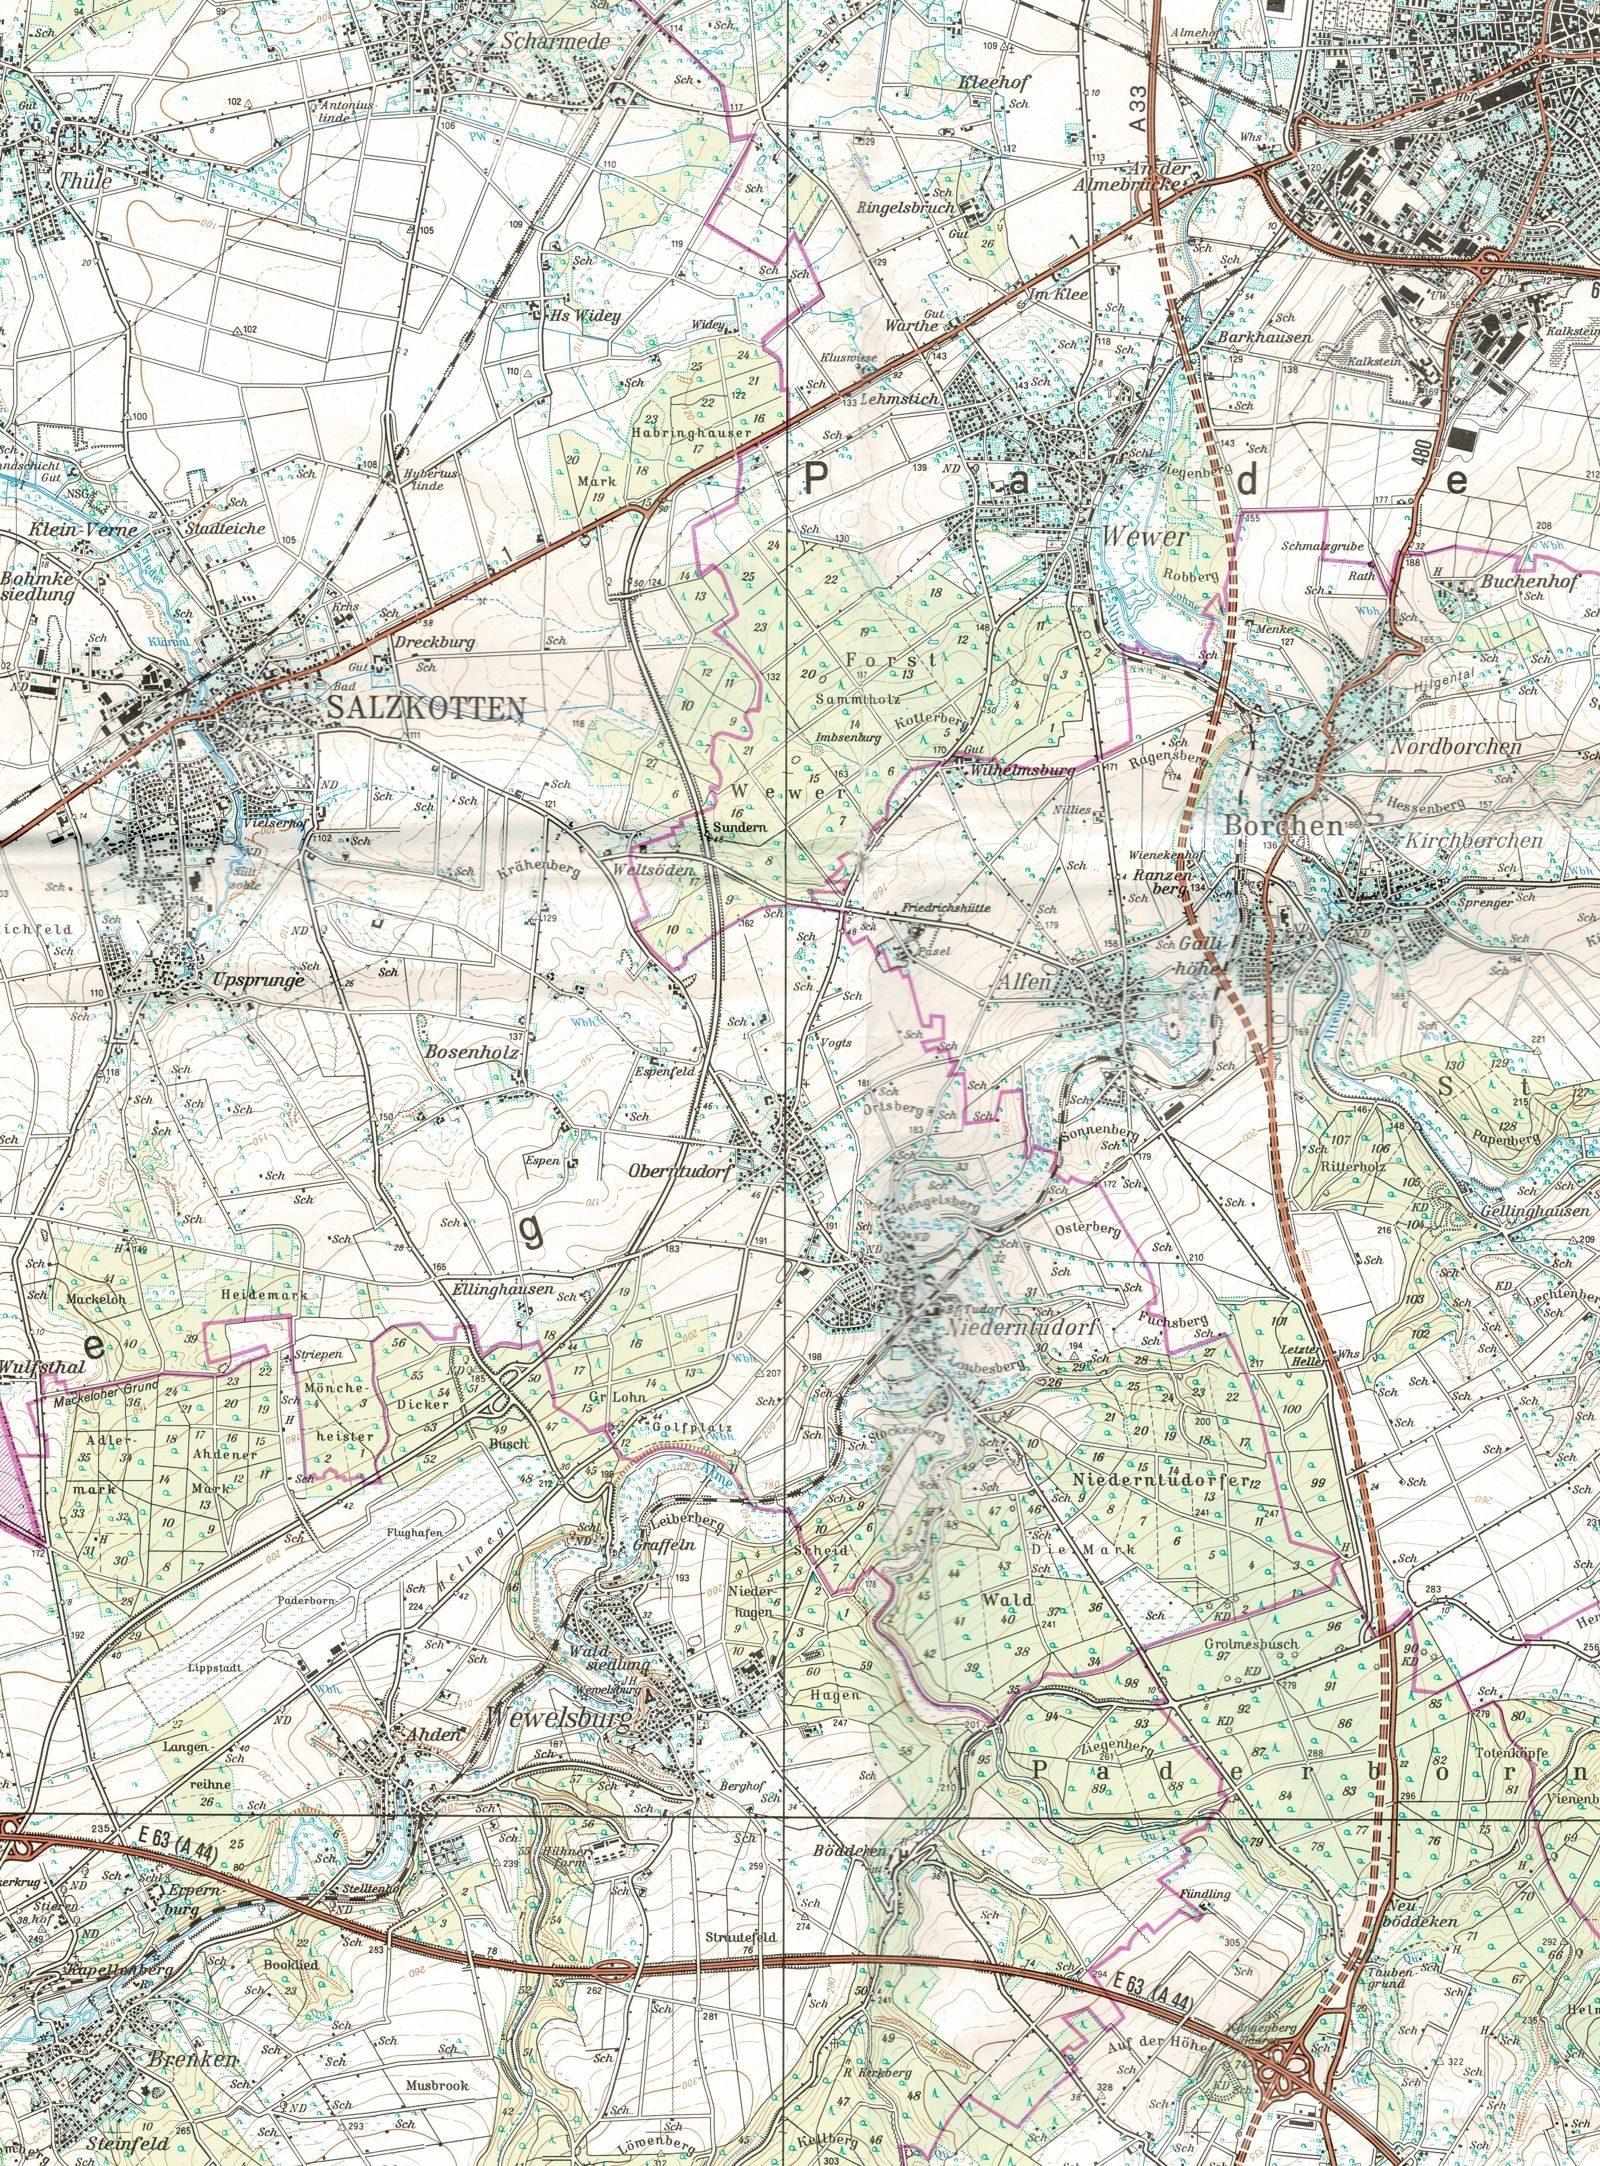 Karte Brenken_Paderborn_1600